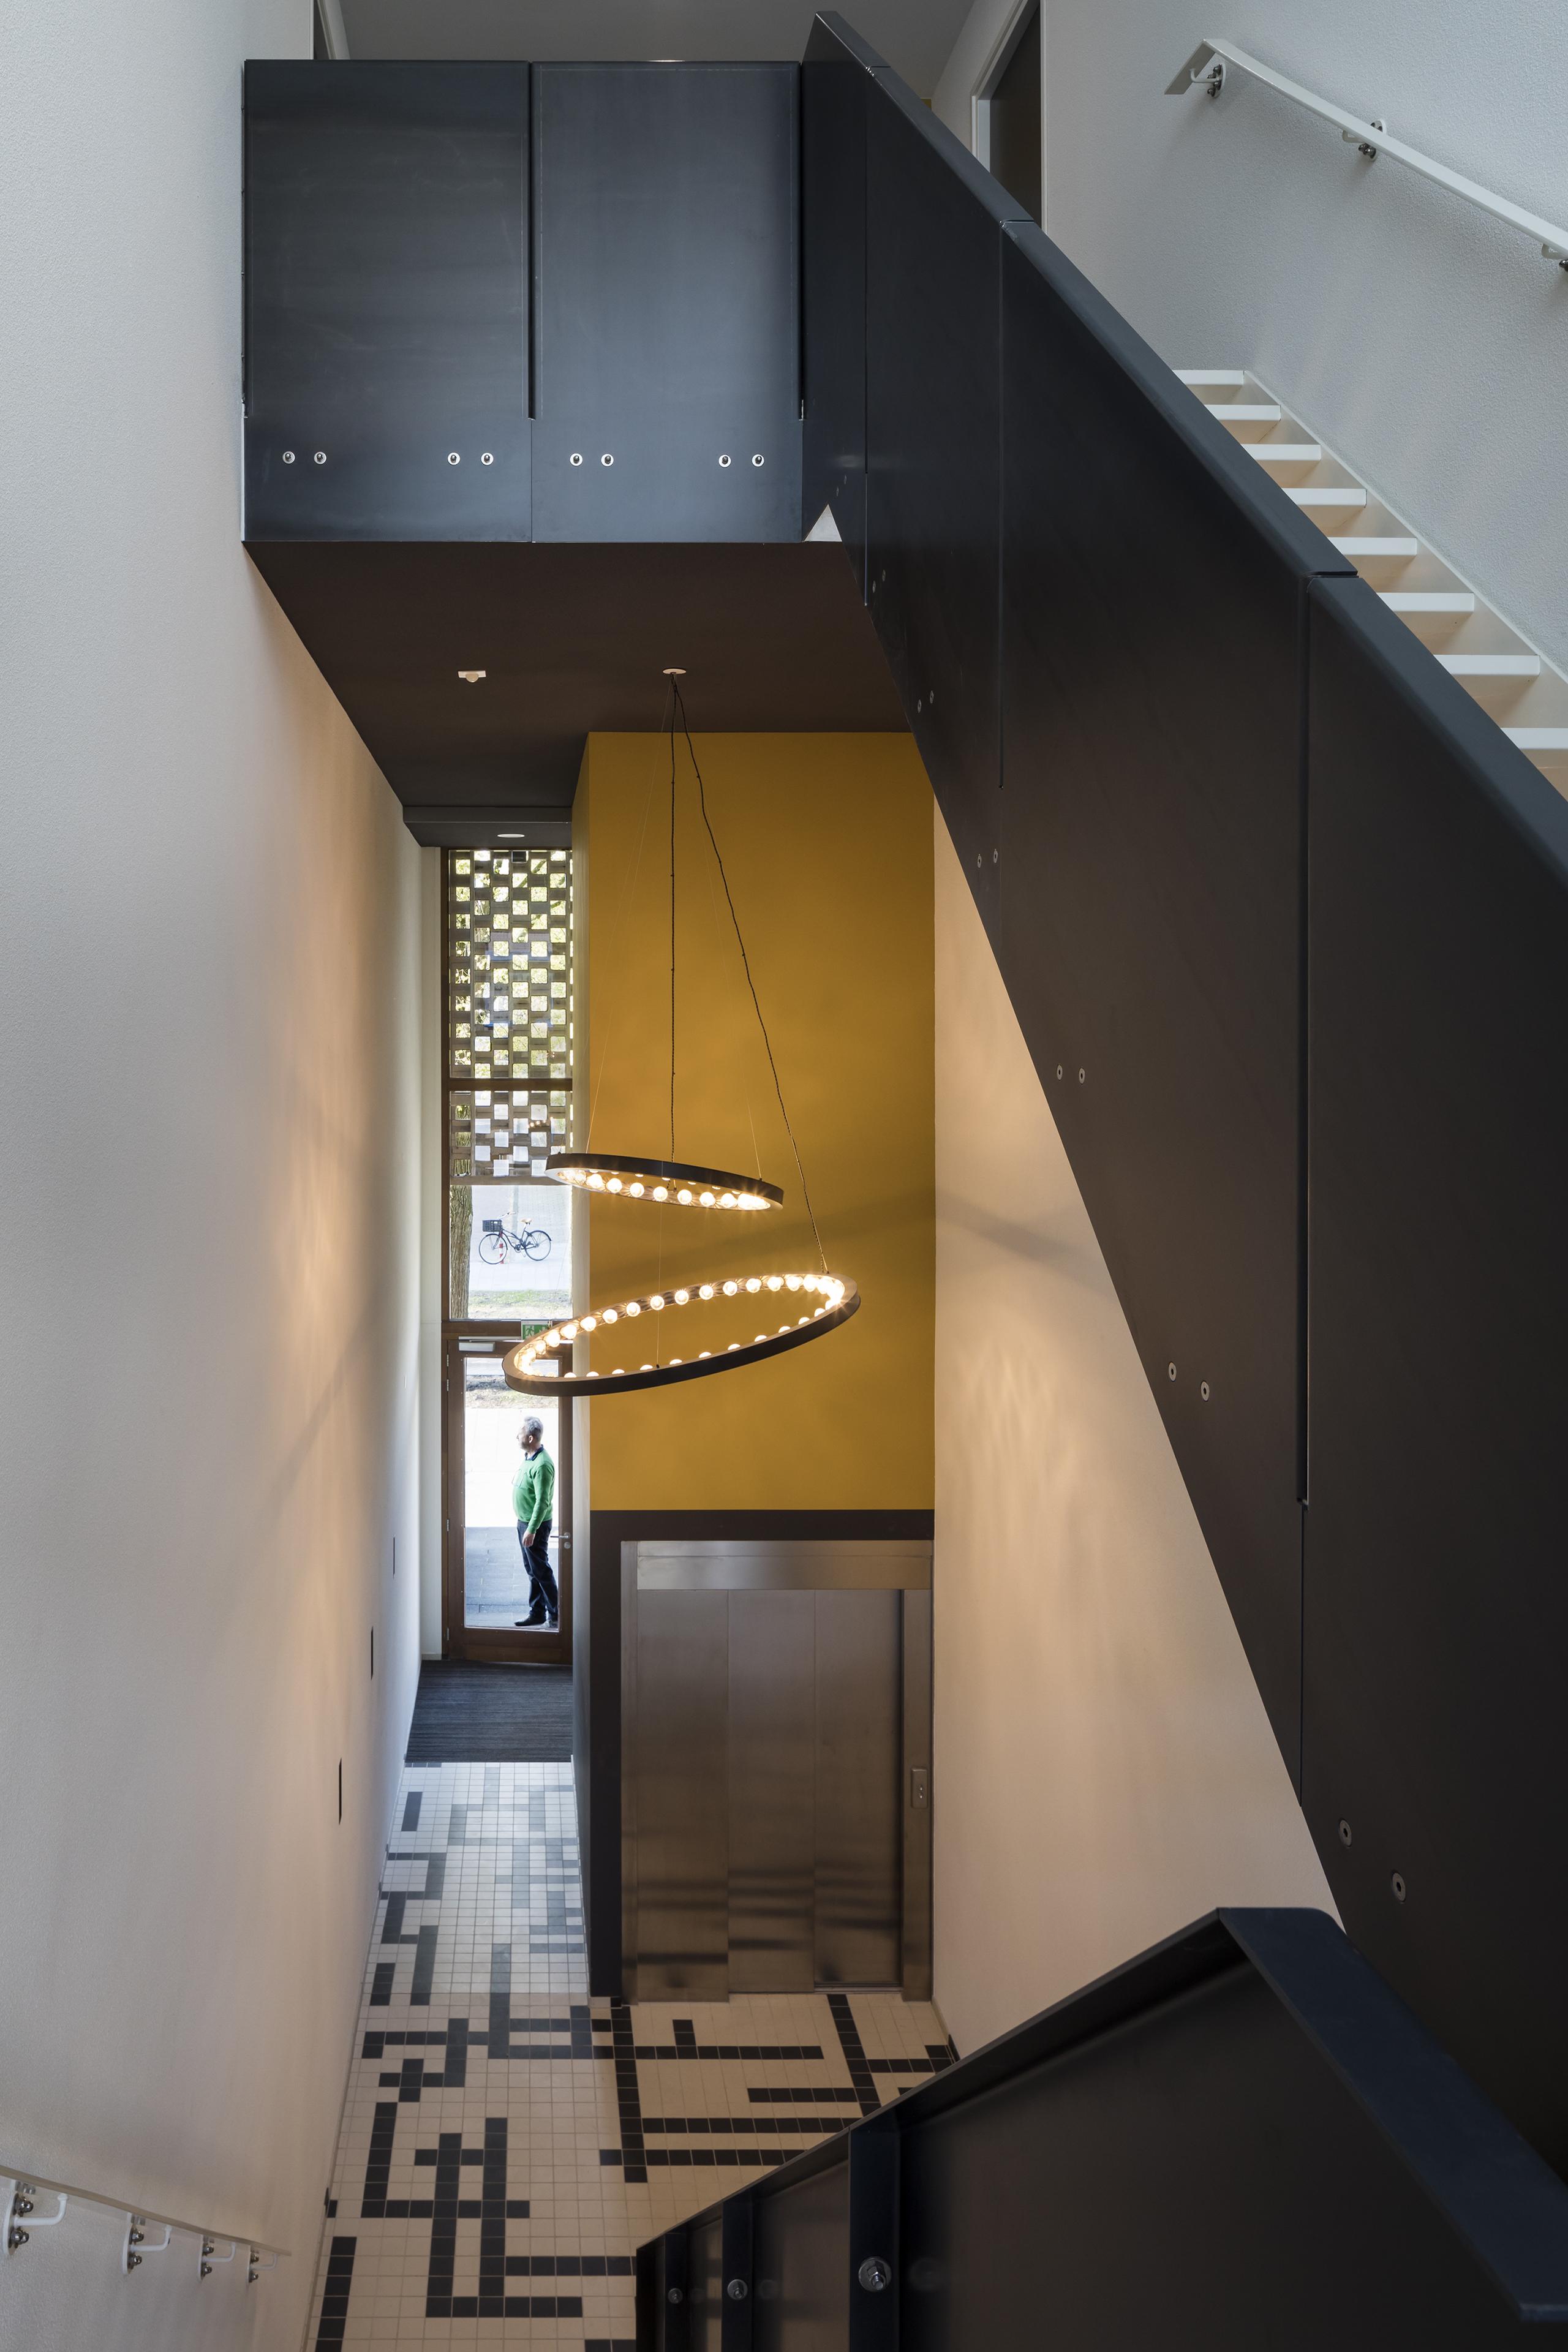 <p>2017, Collectief Particulier Opdrachtgeverschap, appartementen complex Amstelwijck, BLAUW architecten</p>